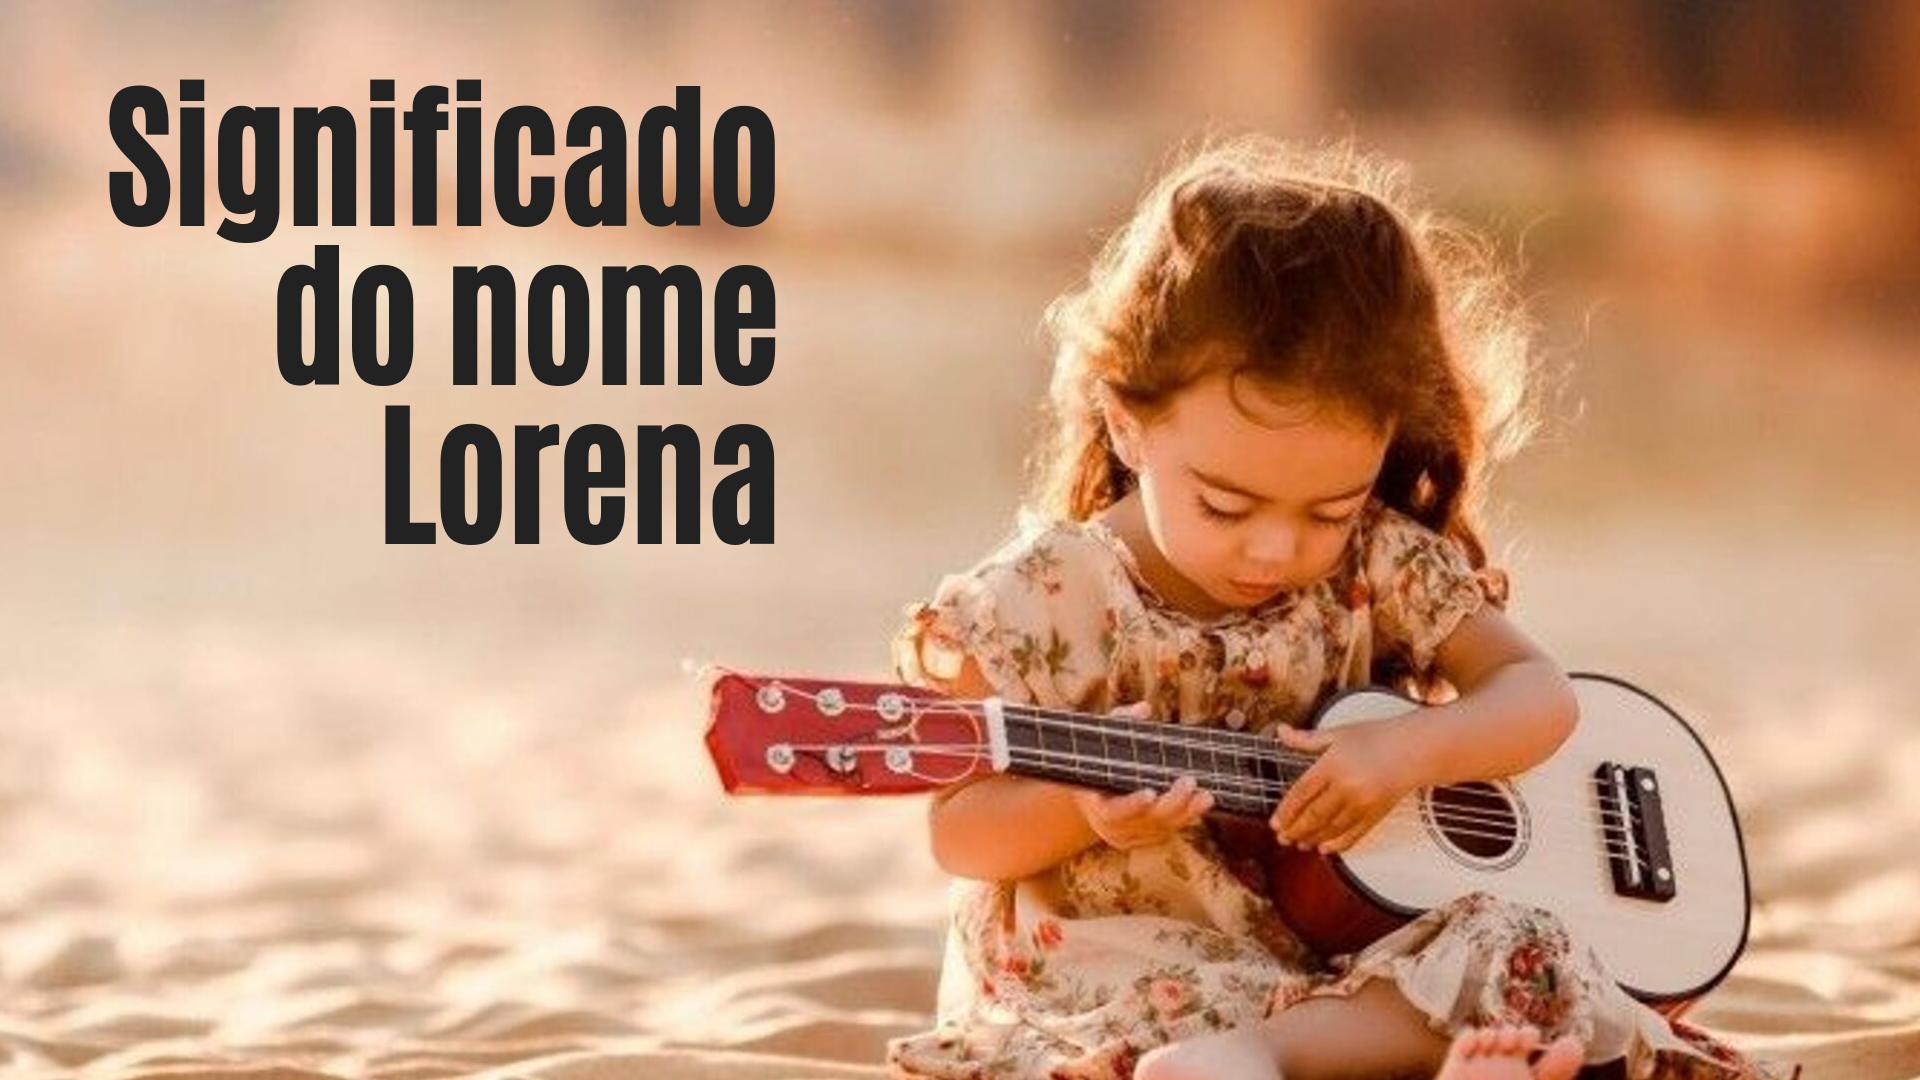 foto escrita significado do nome lorena